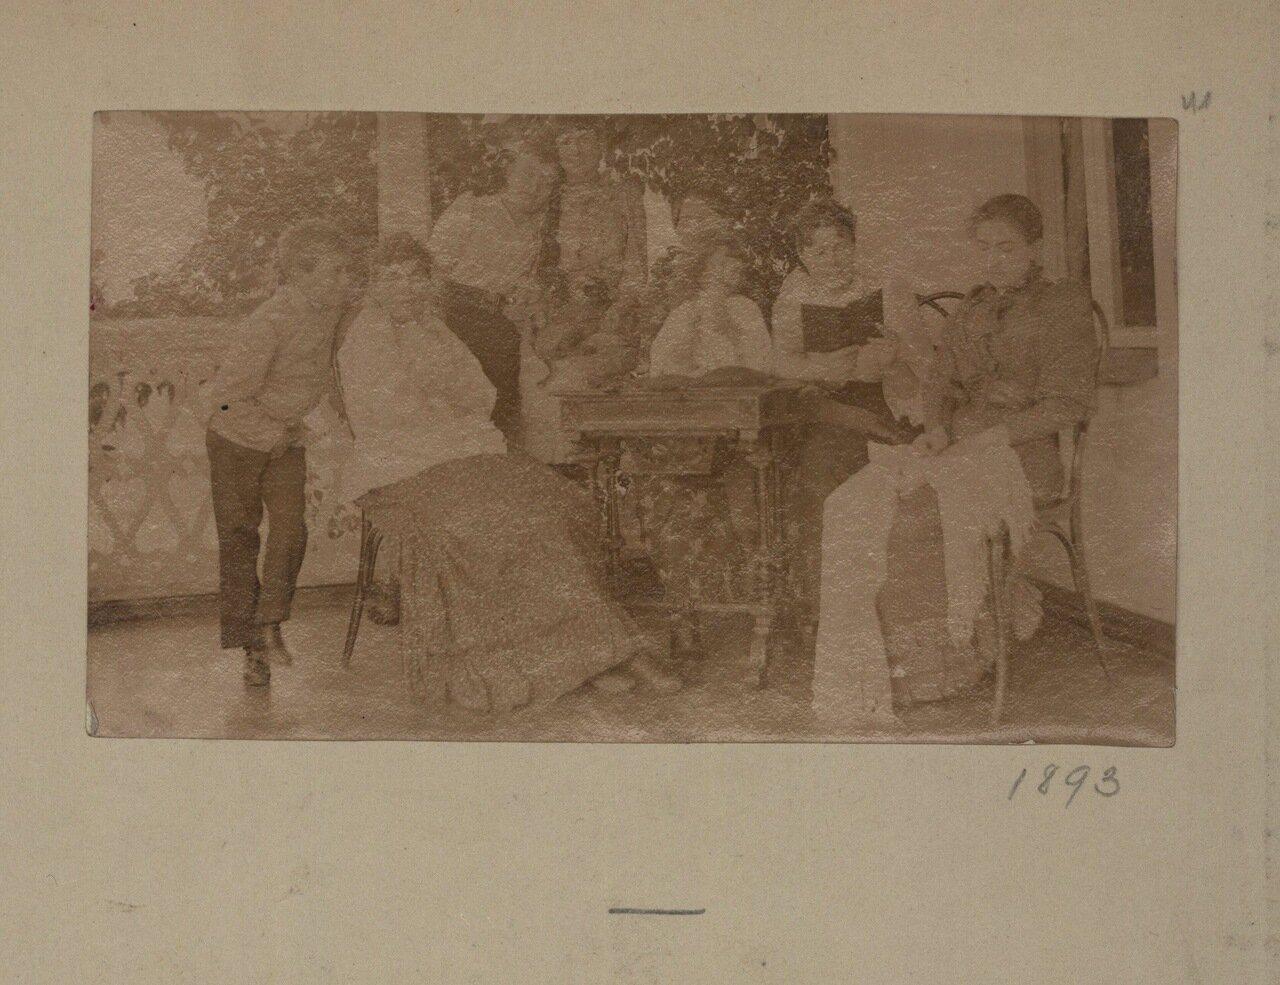 26. 1893